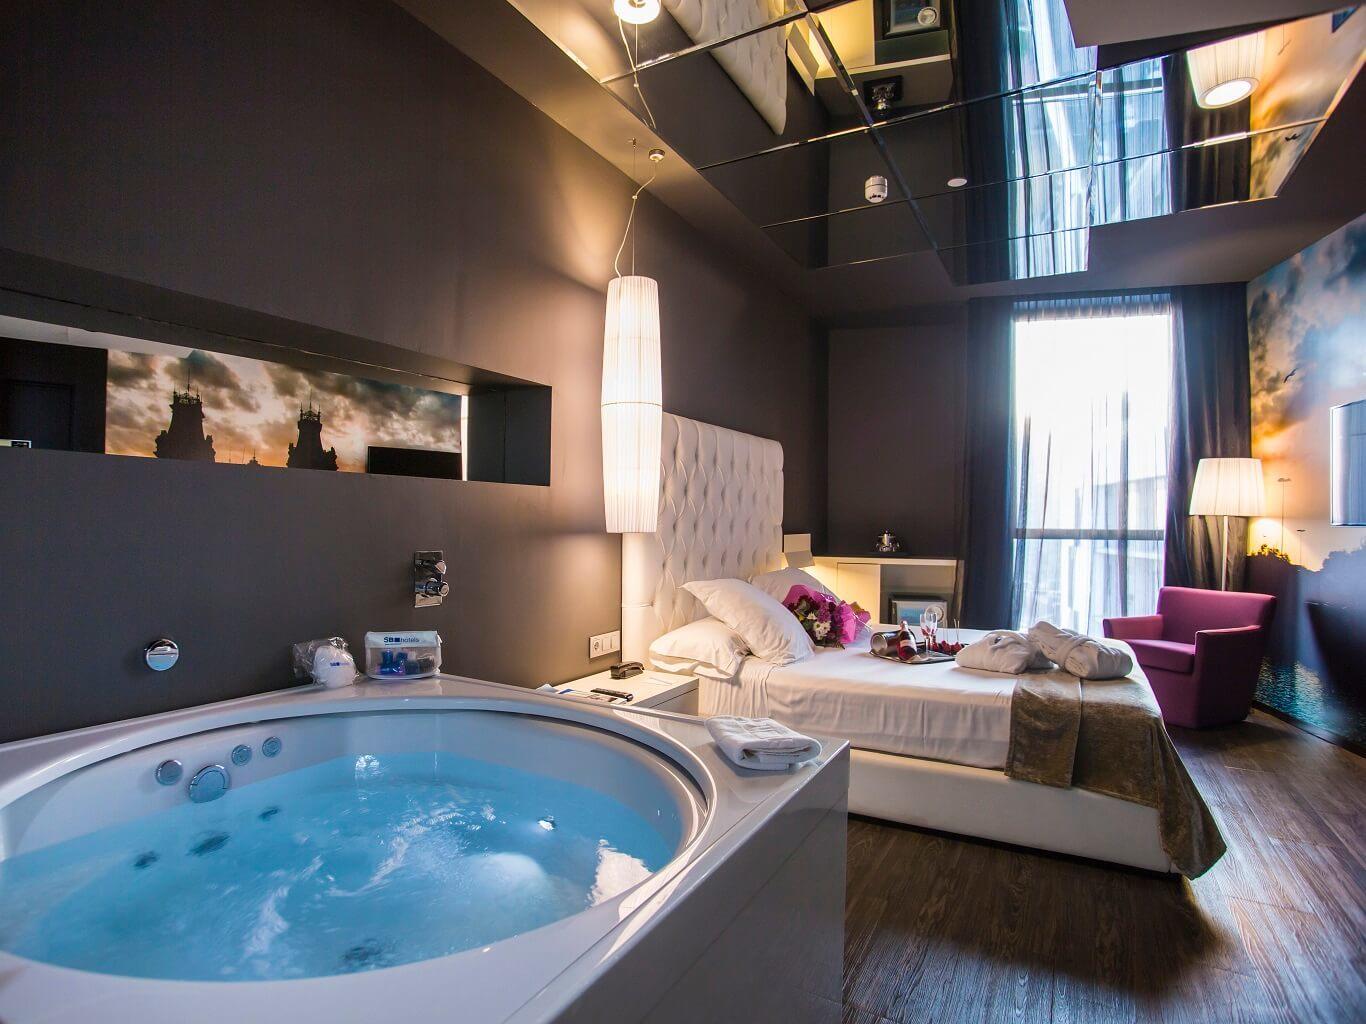 Jacuzzi suite hotel sb plaza europa l hospitalet de - Jacuzzi in camera da letto ...